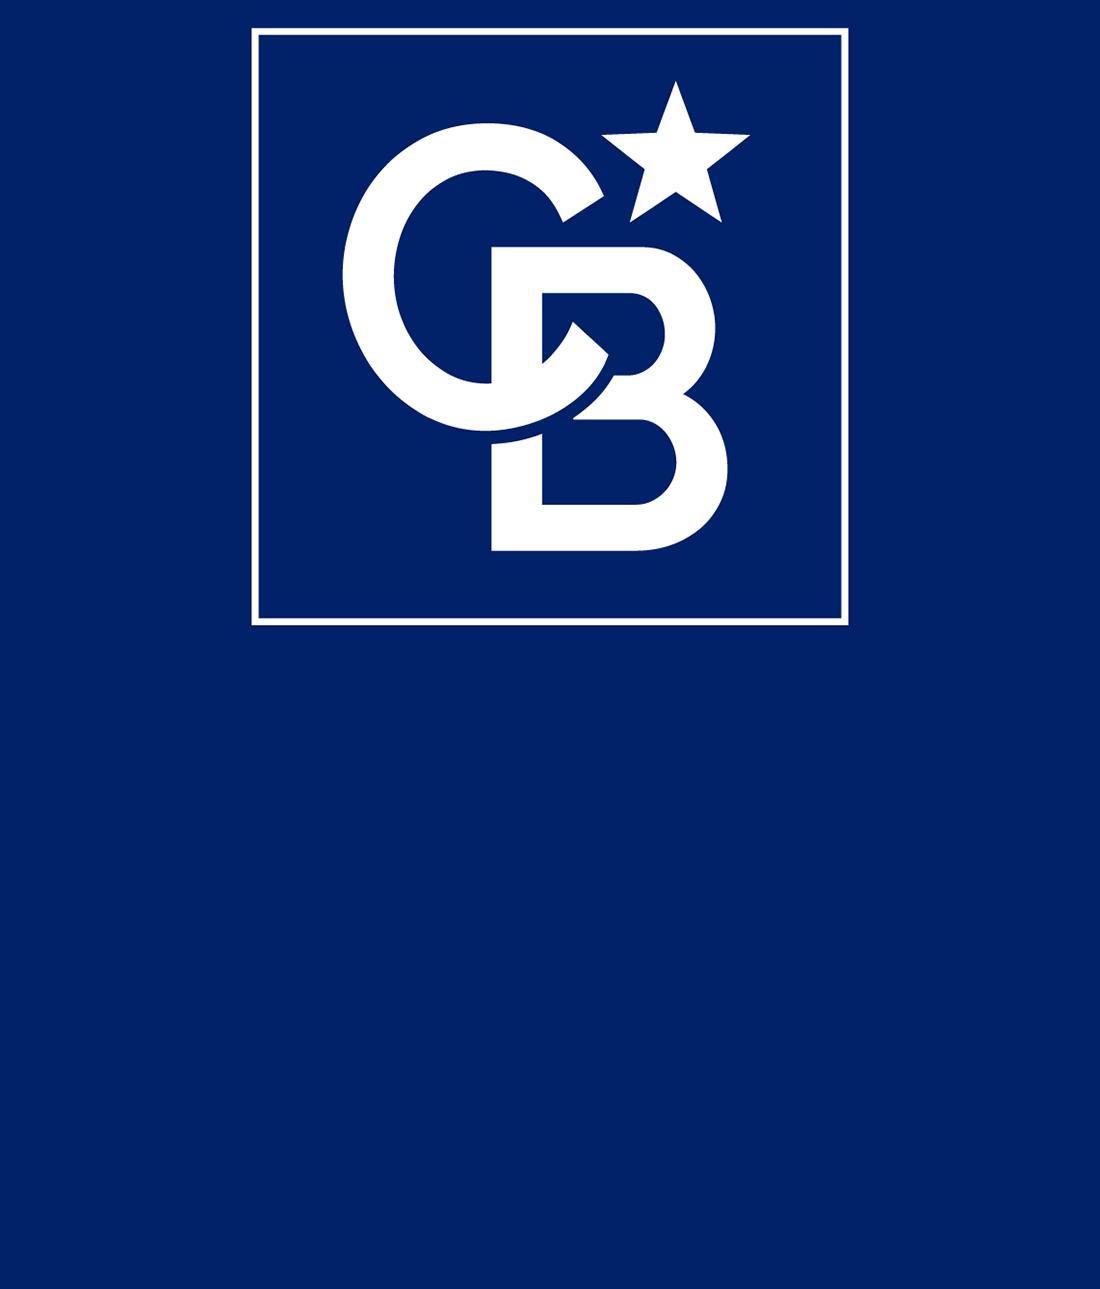 cbhs01 Logo